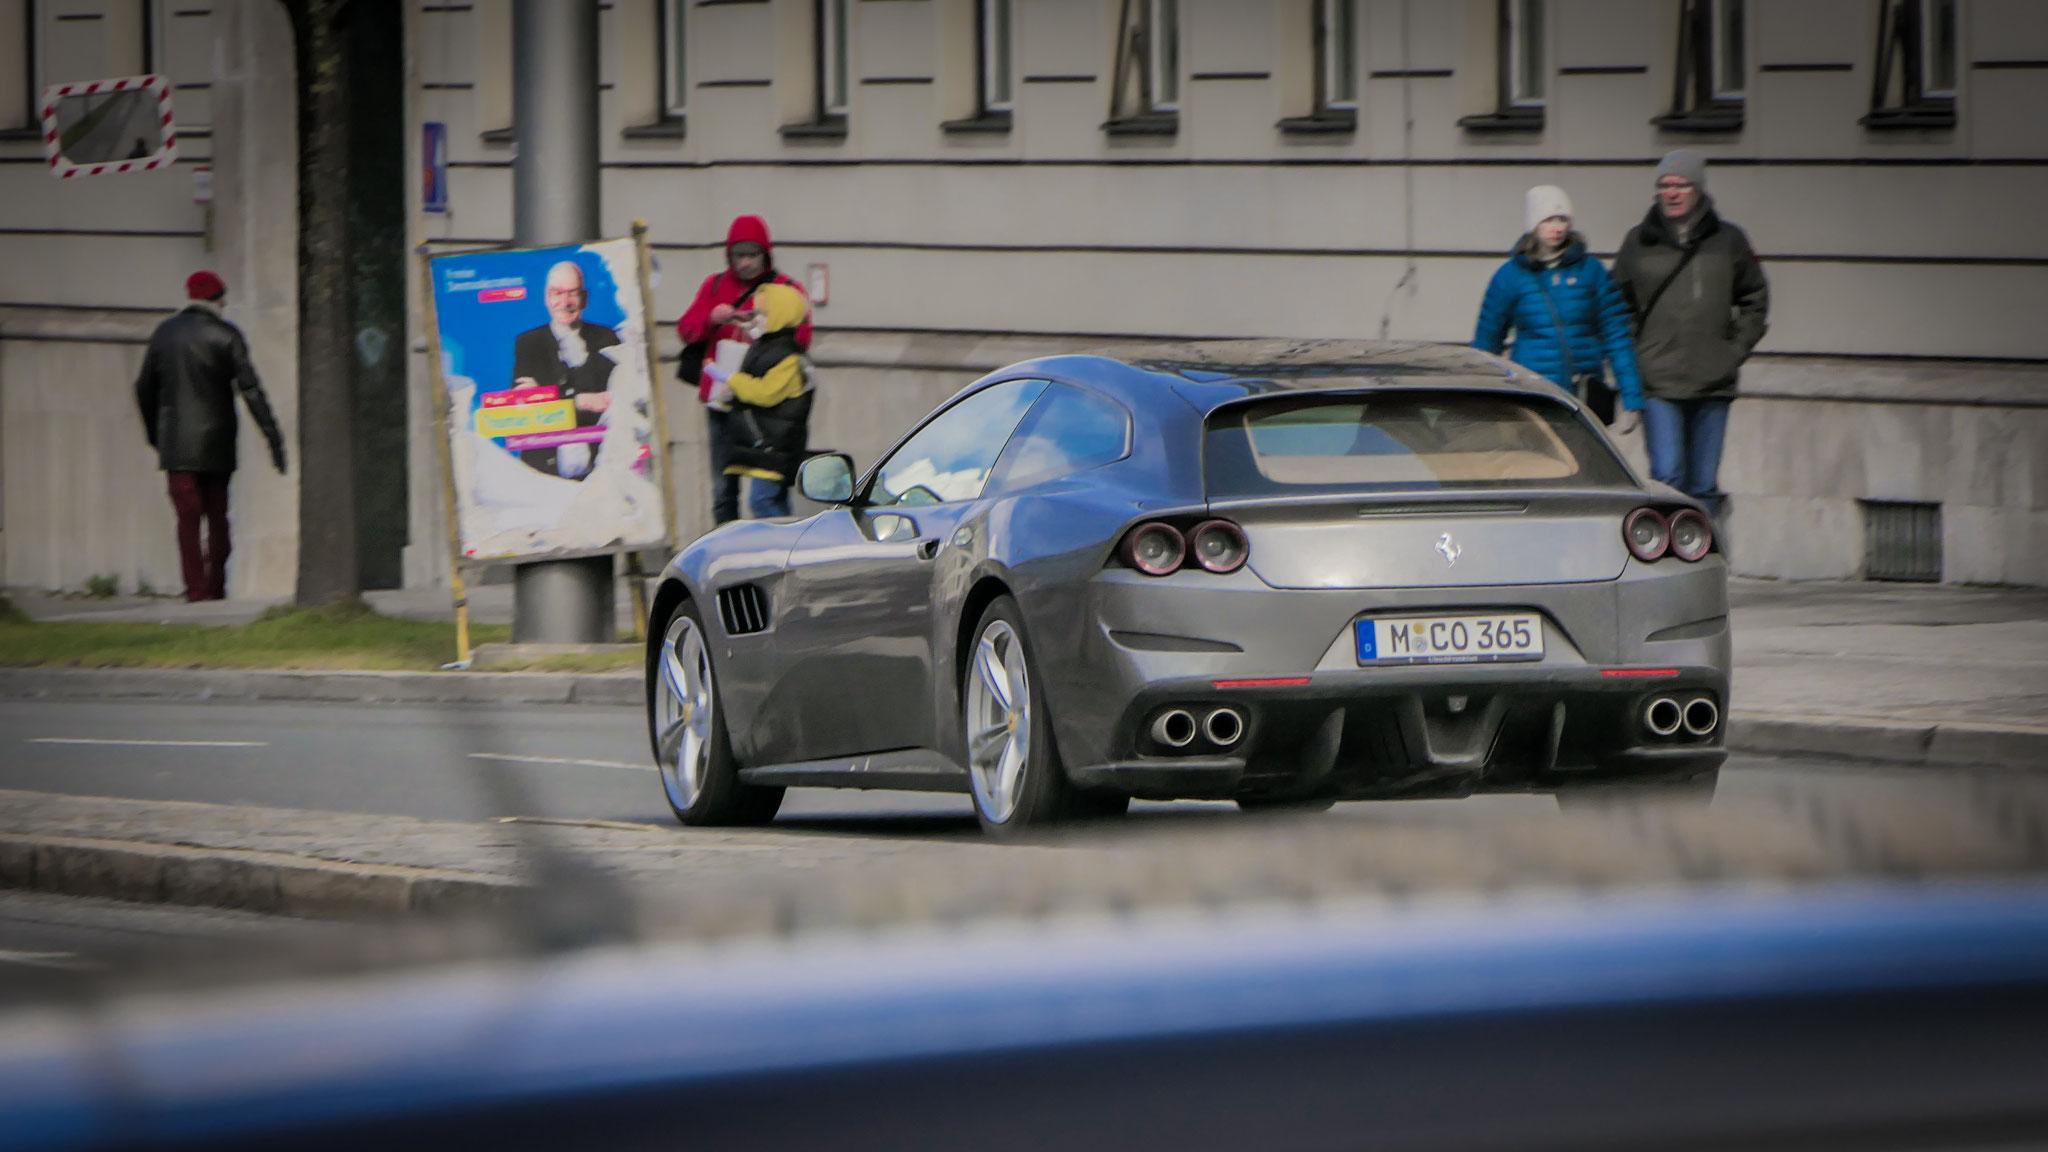 Ferrari GTC4 Lusso - M-CO-365